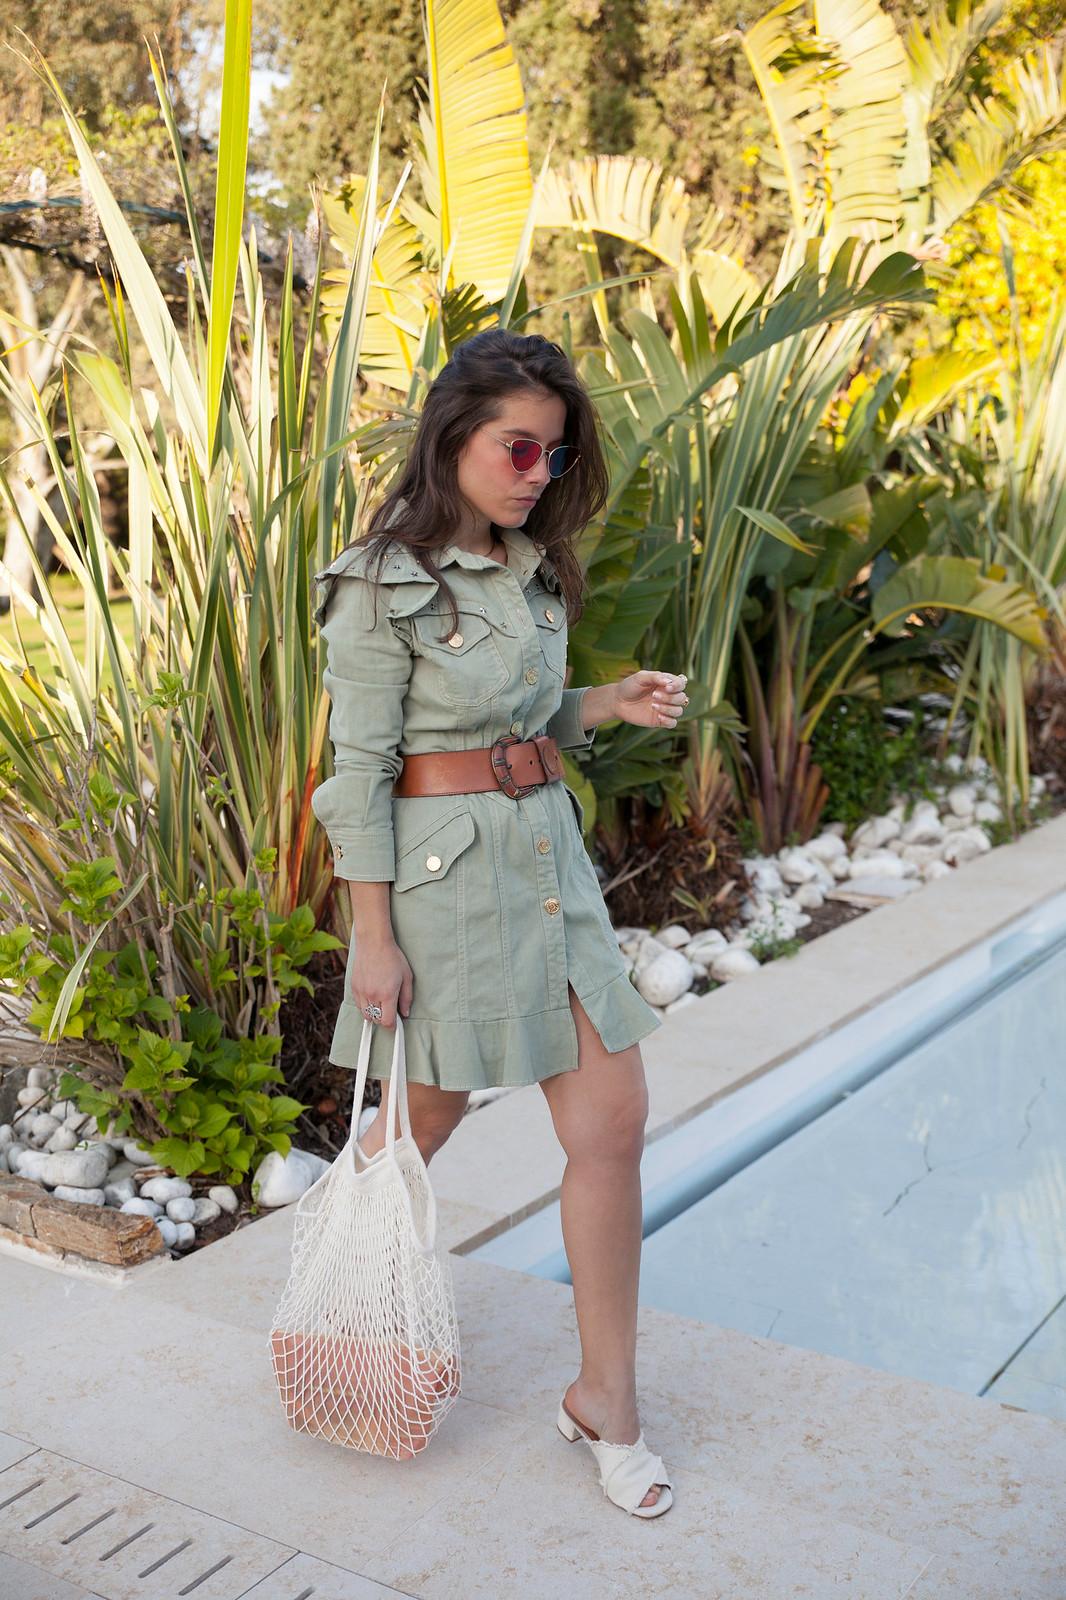 theguestgirl influencer barcelona saint tropez style brigitte bardot vestido verde de moda